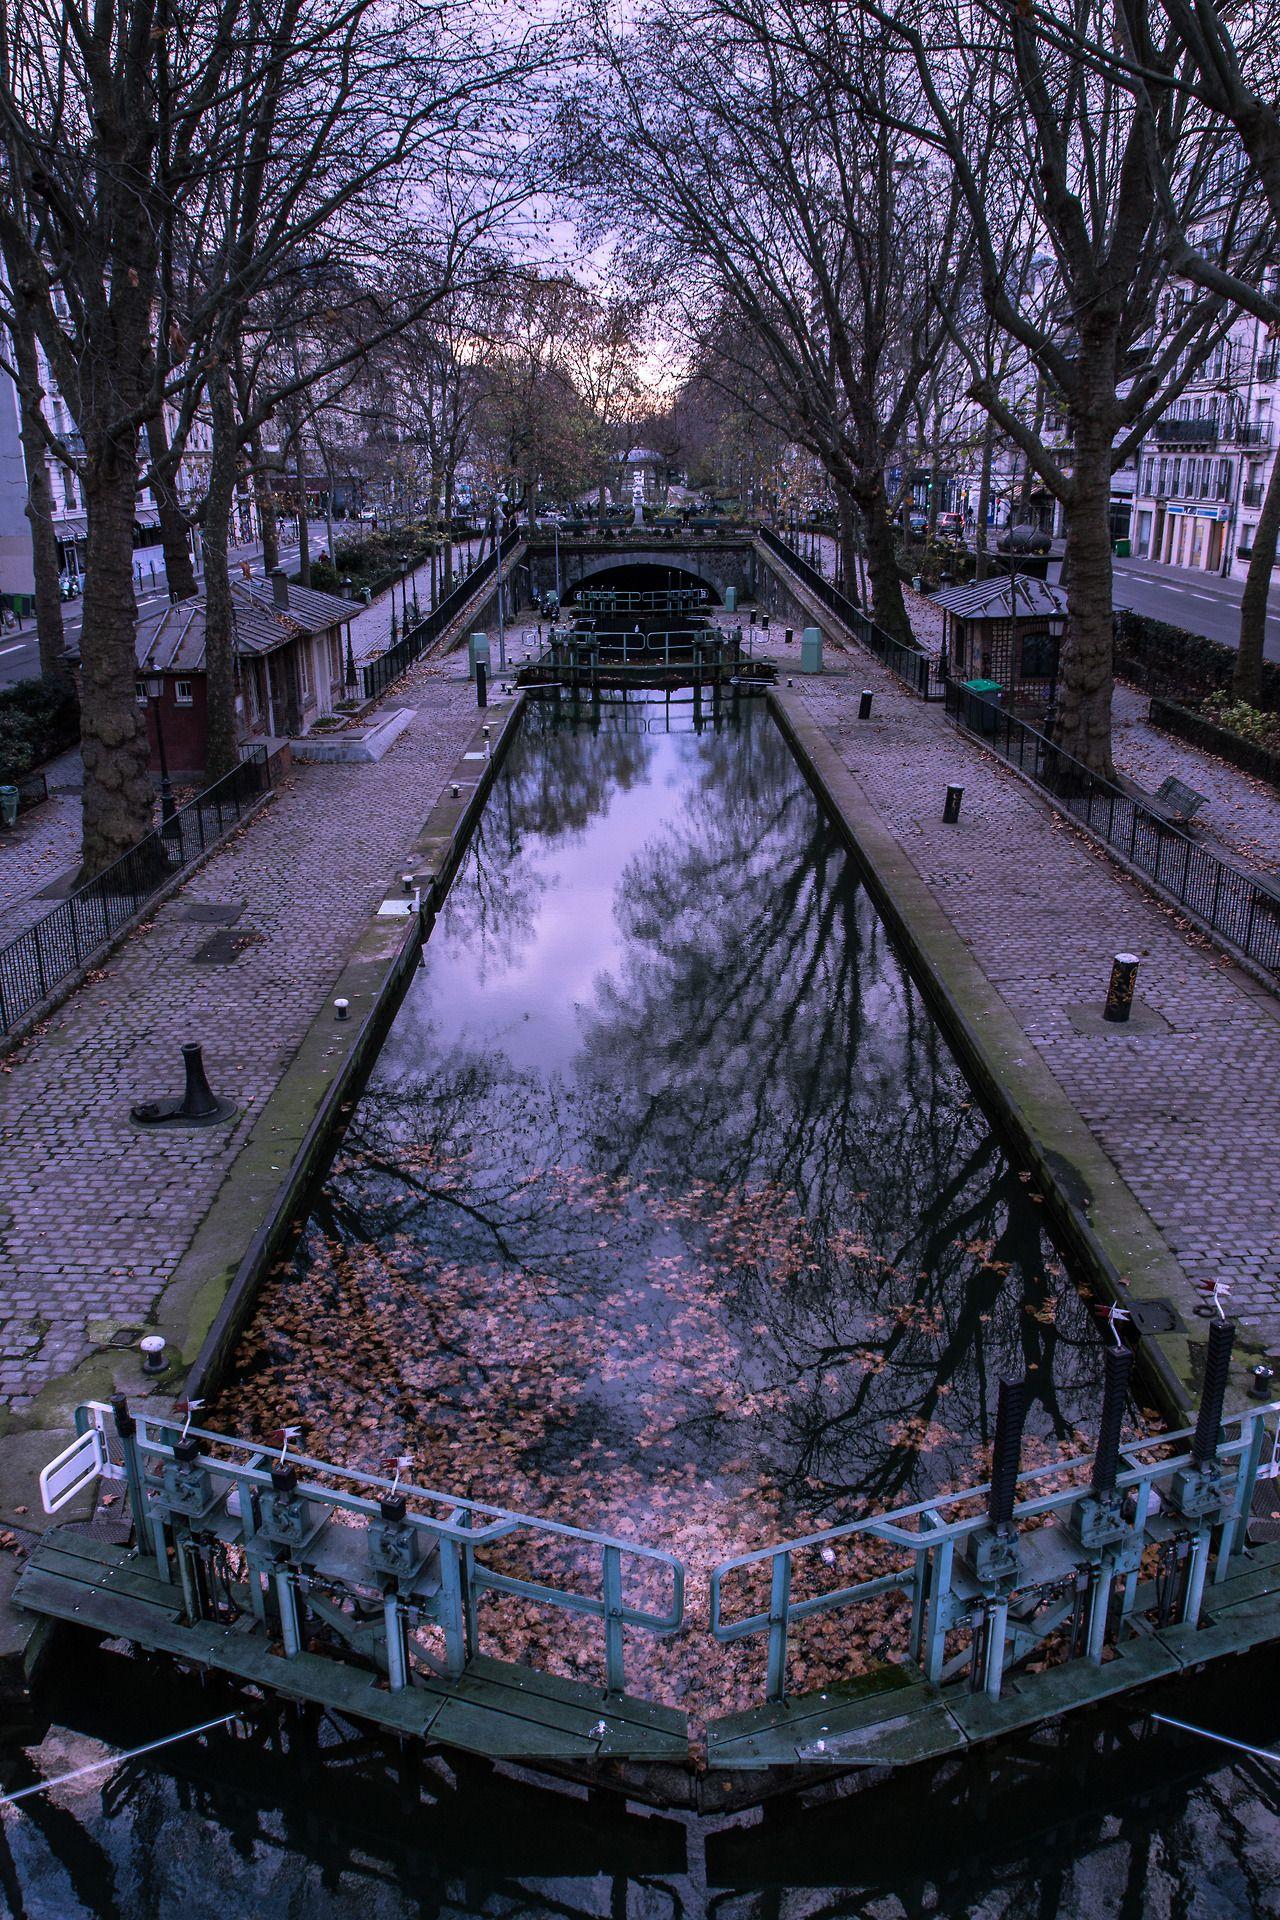 home sweet home #photo Canal St Martin #PEAV #Paris10 @Menilmuche @Tanya Knyazeva Knyazeva Knyazeva Lotts Titam